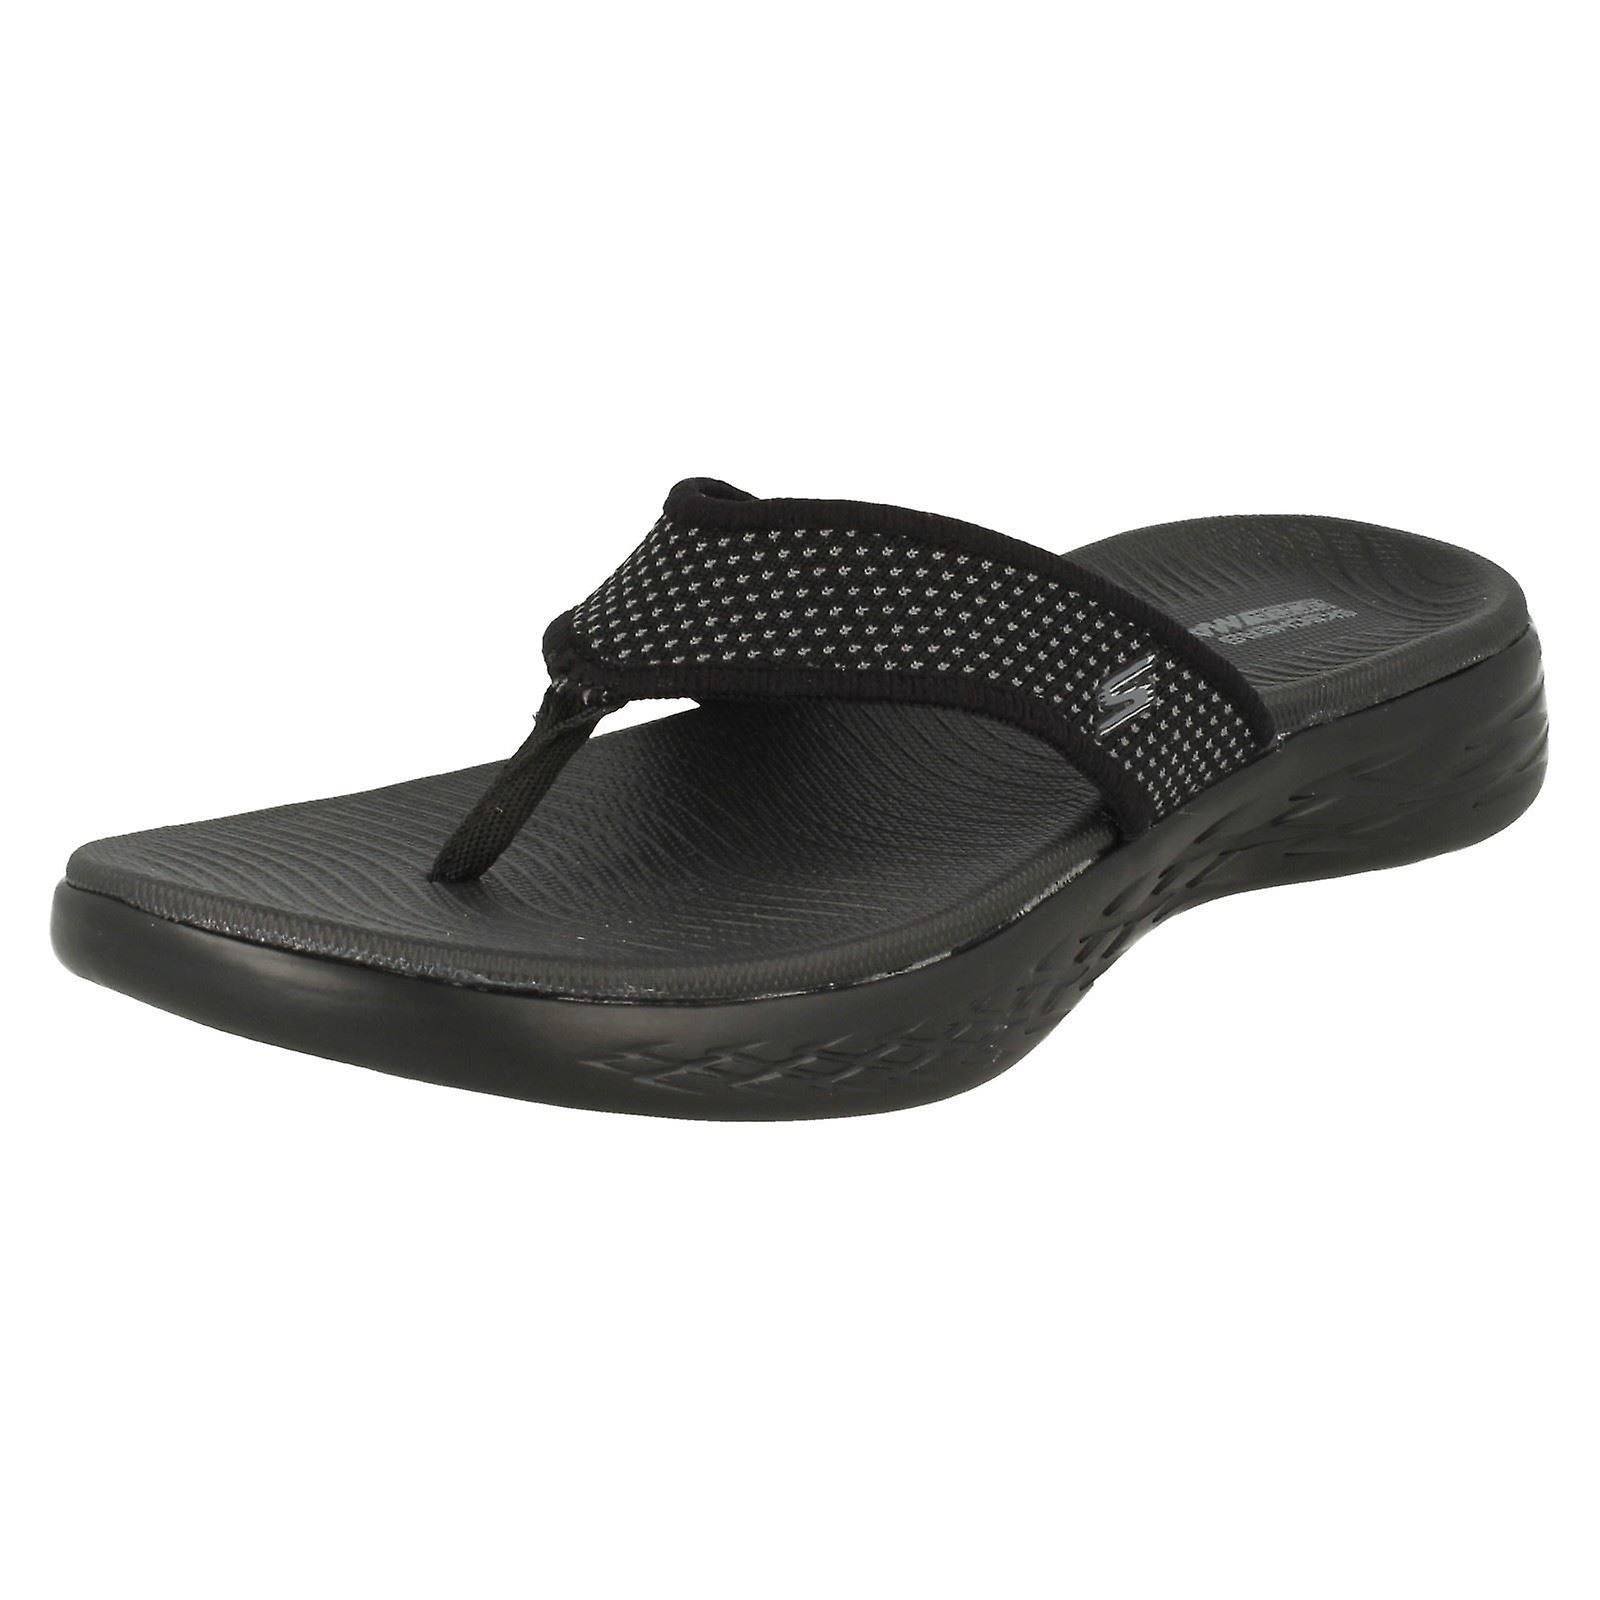 Ladies Skechers Casual Slip On Flip Flops On The Go 600 15300 Black Textile UK Size 3 EU Size 36 US Size 6